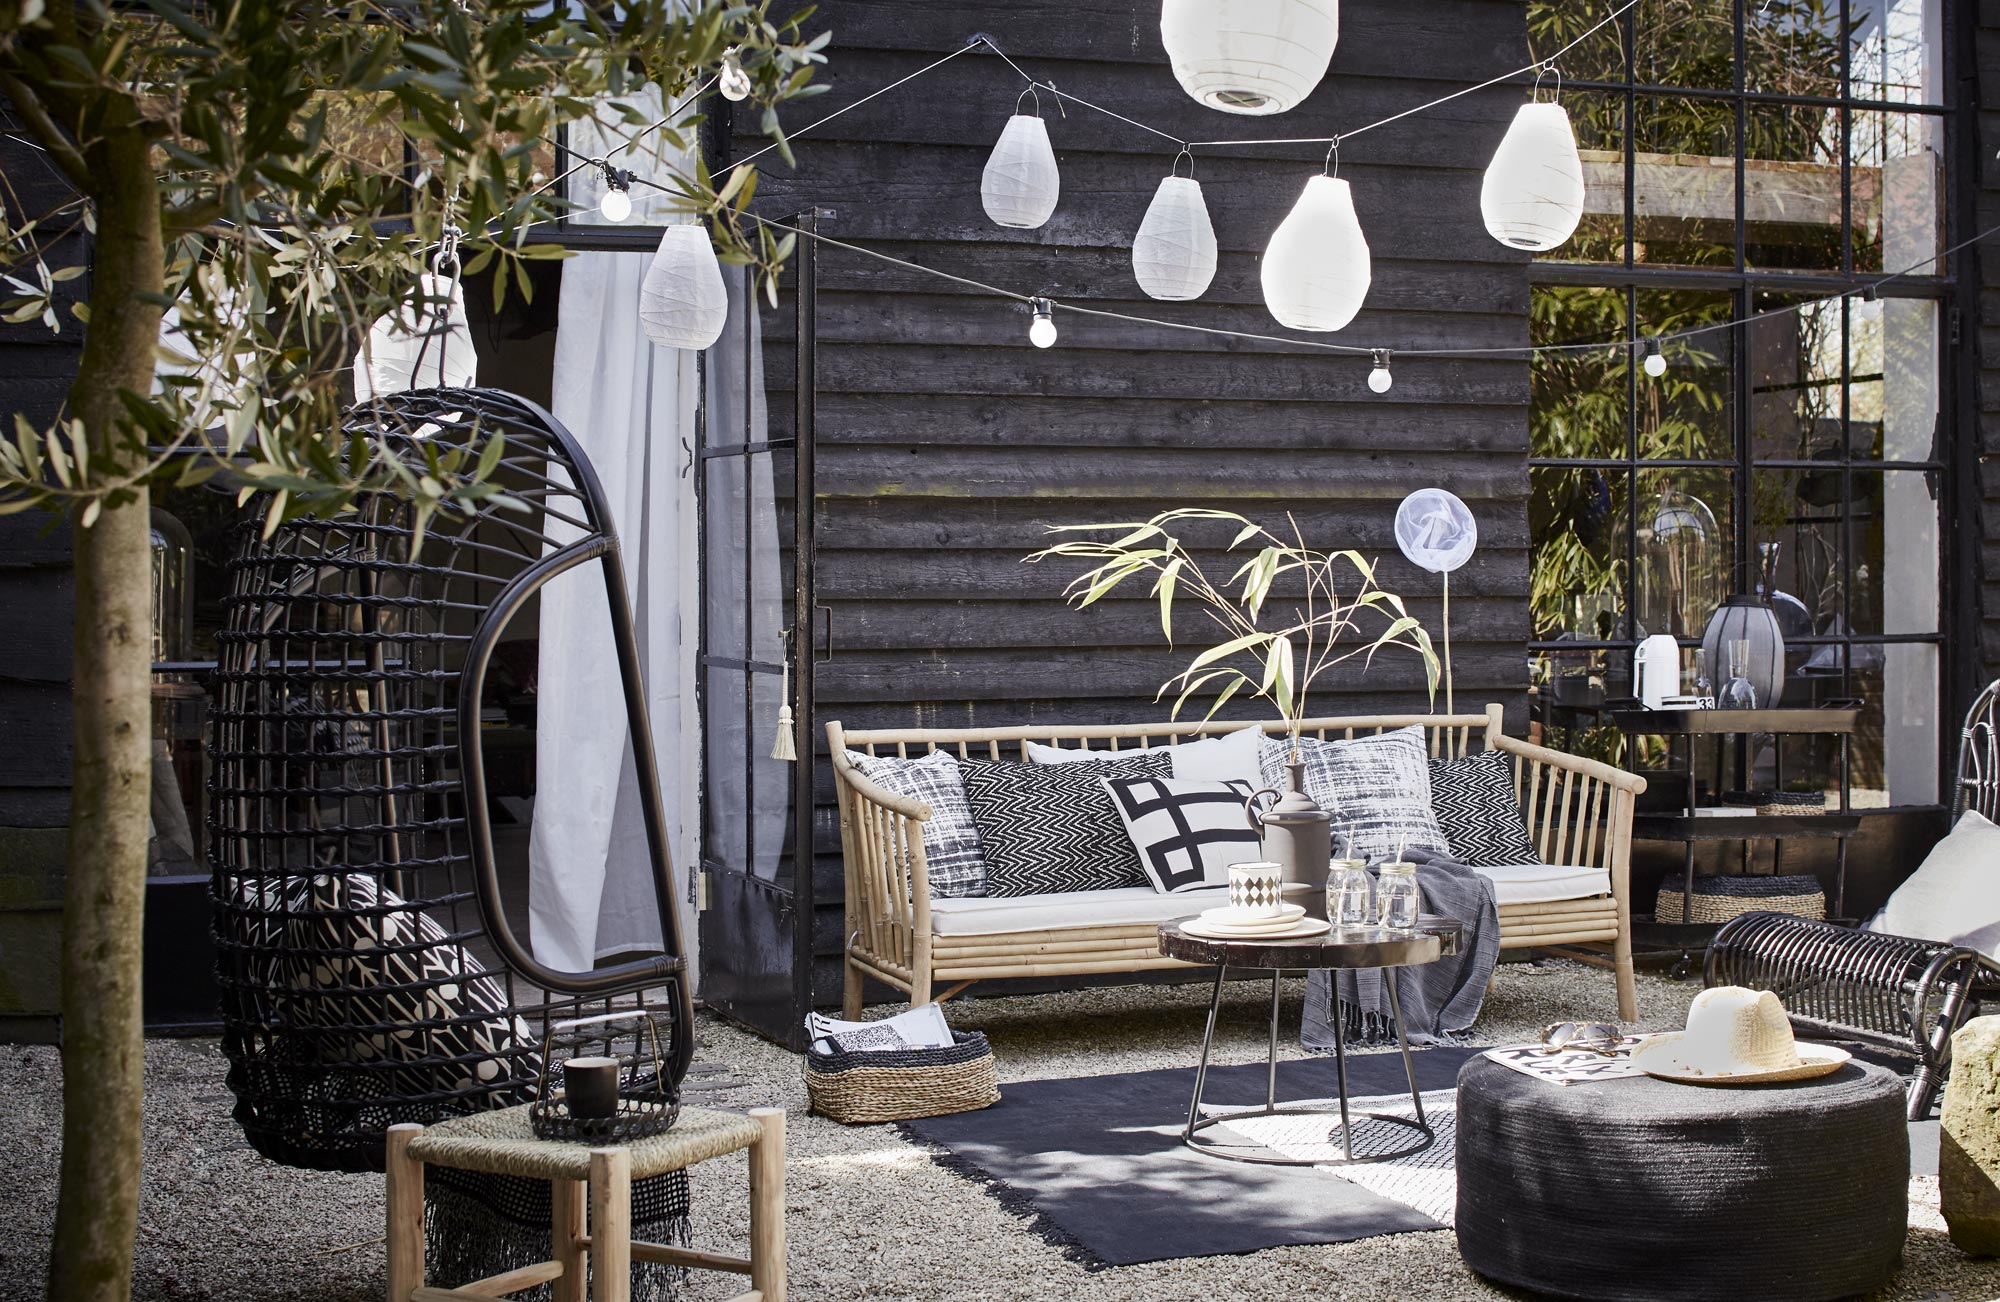 De gezellige vtwonen tuin homease for Terras decoratie